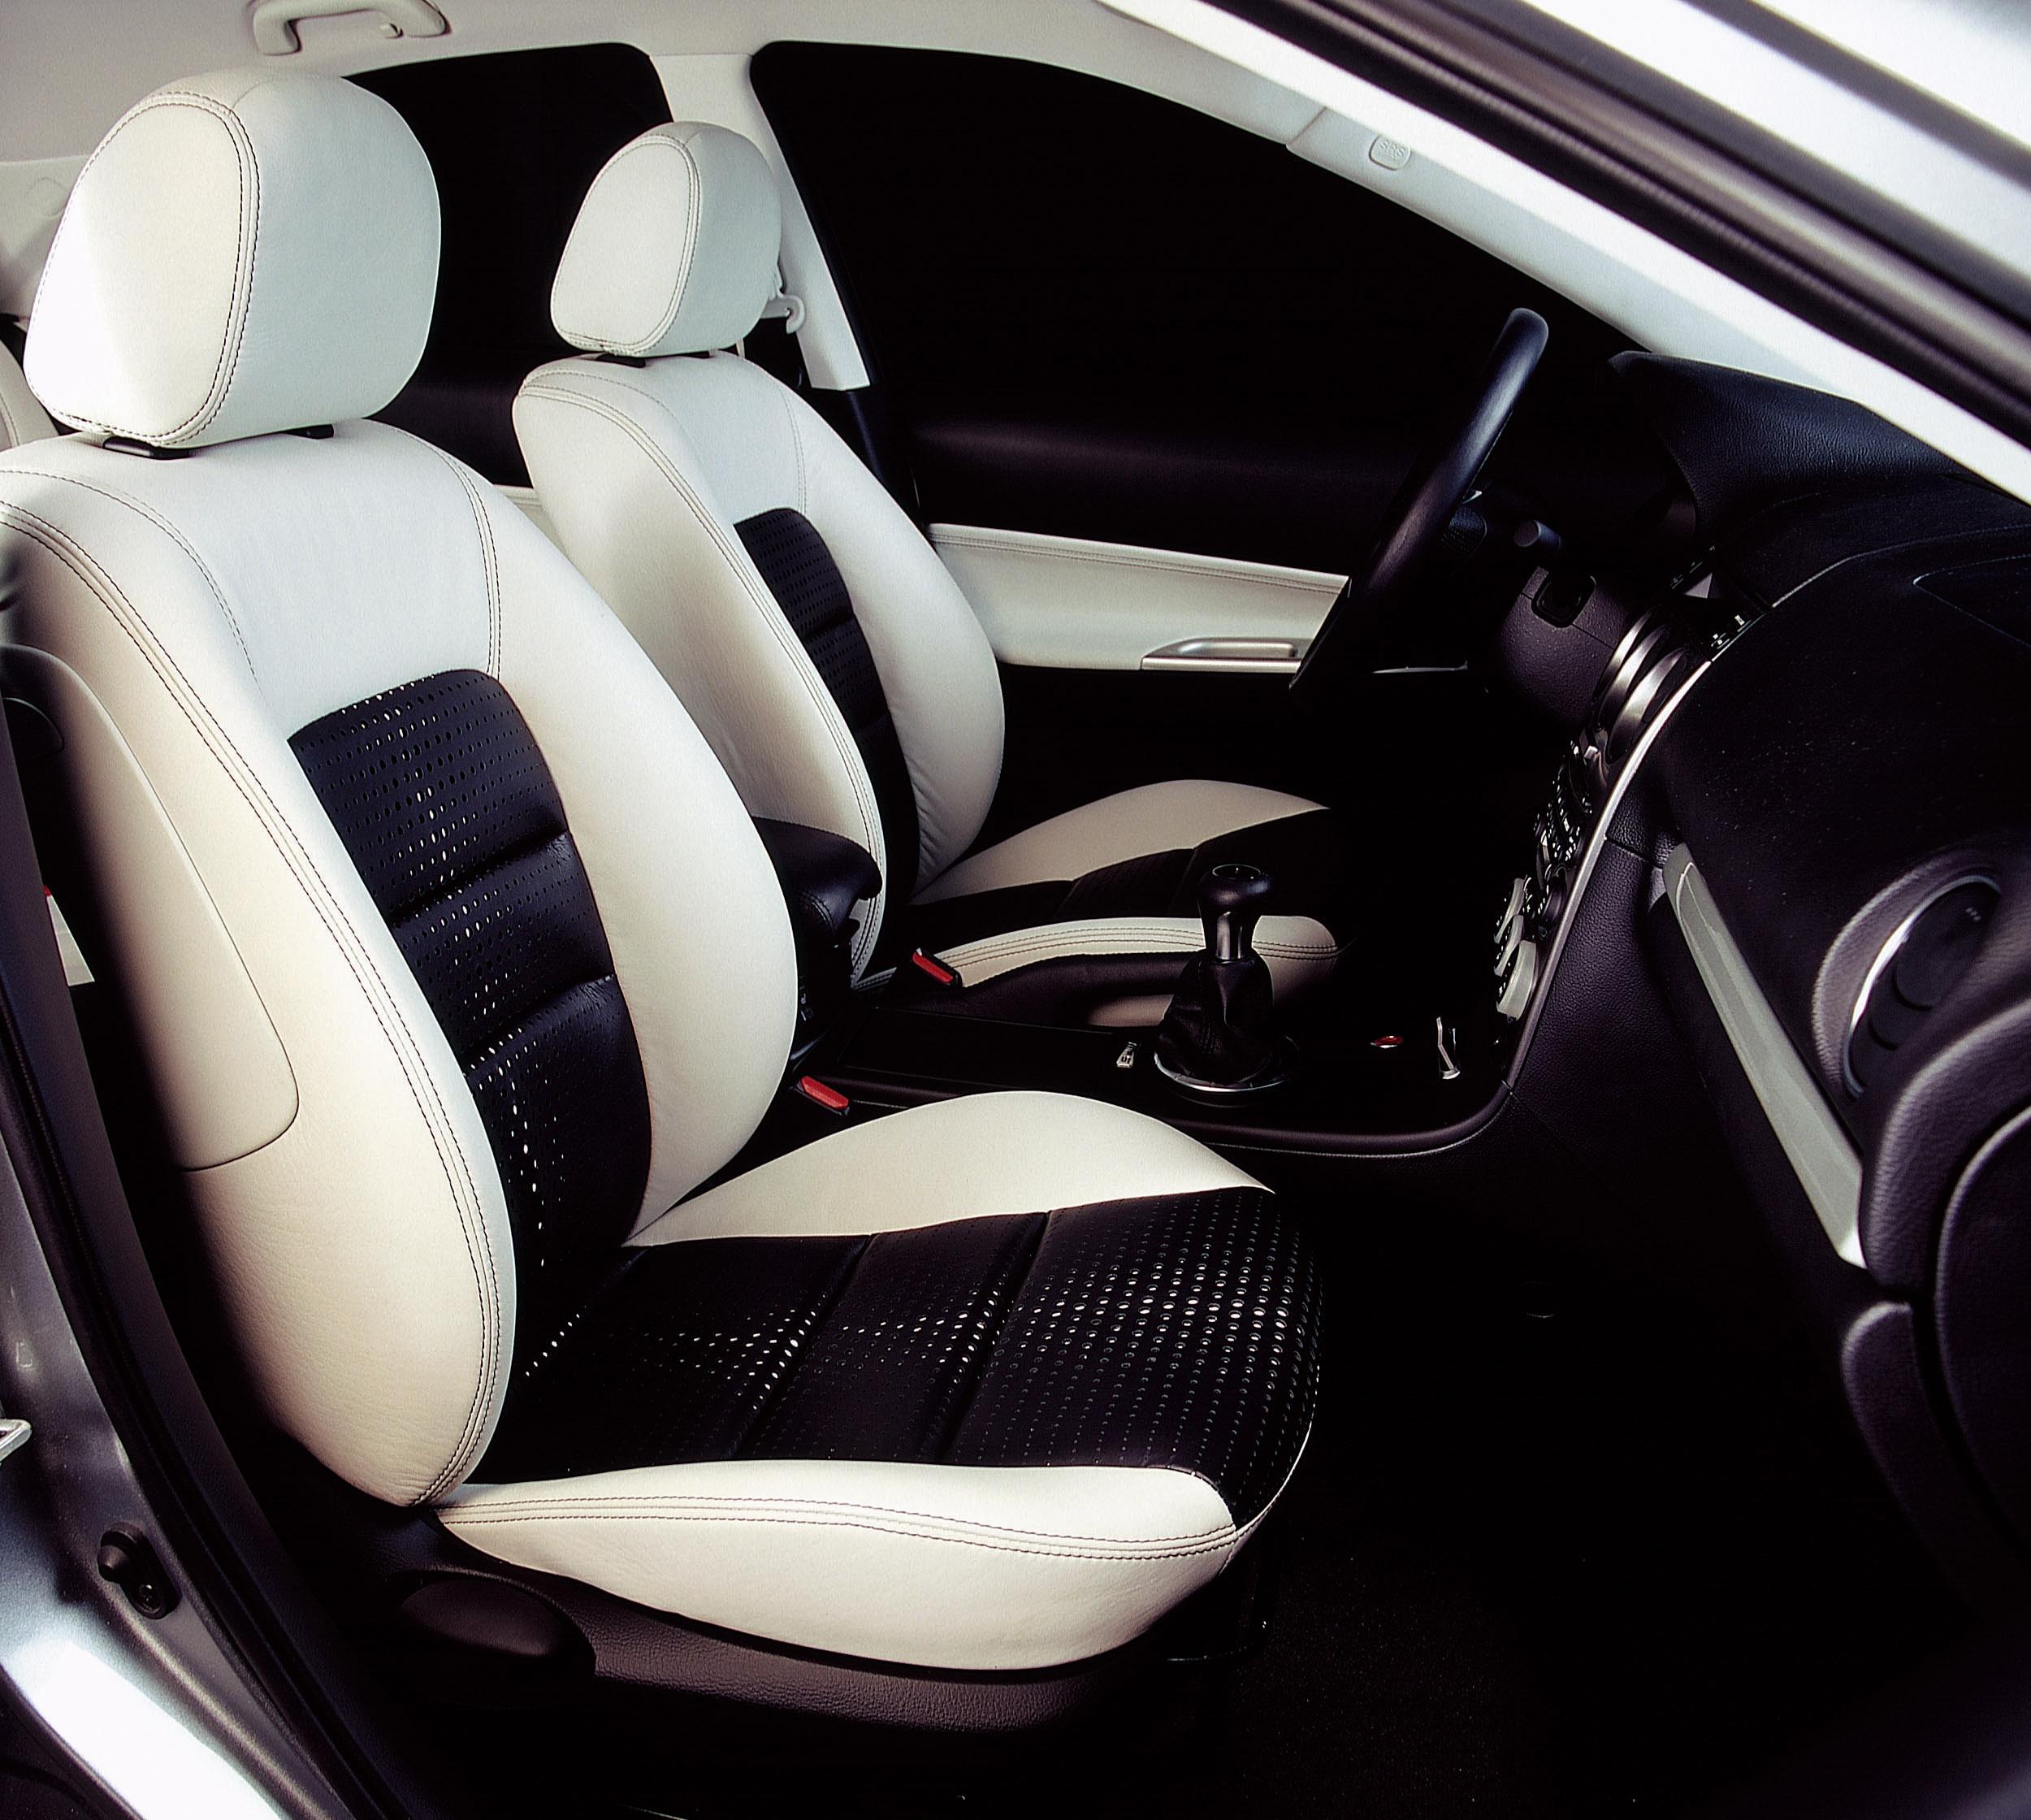 2010 Mazda Mazda6 Interior: Regula Exclusive Porsche Panamera In Carbon Fiber